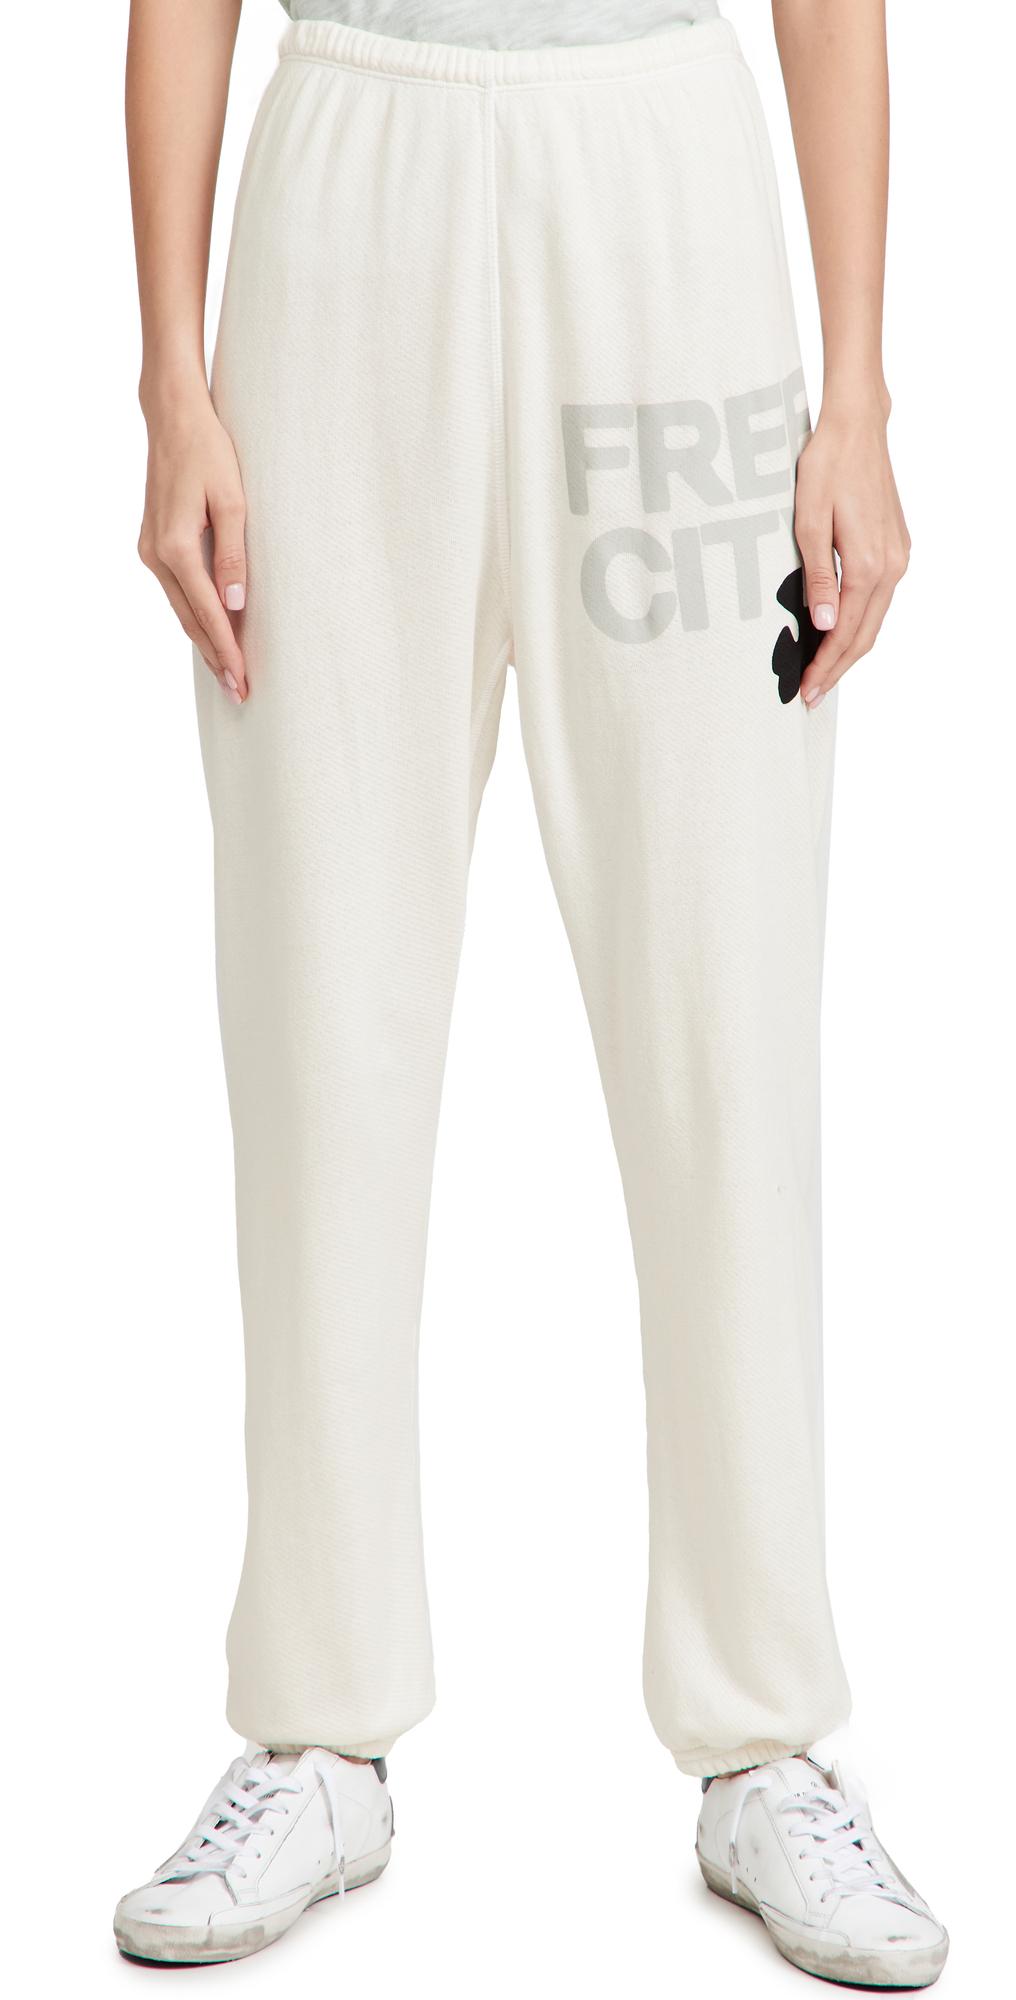 Superfluff Lux OG Sweatpants